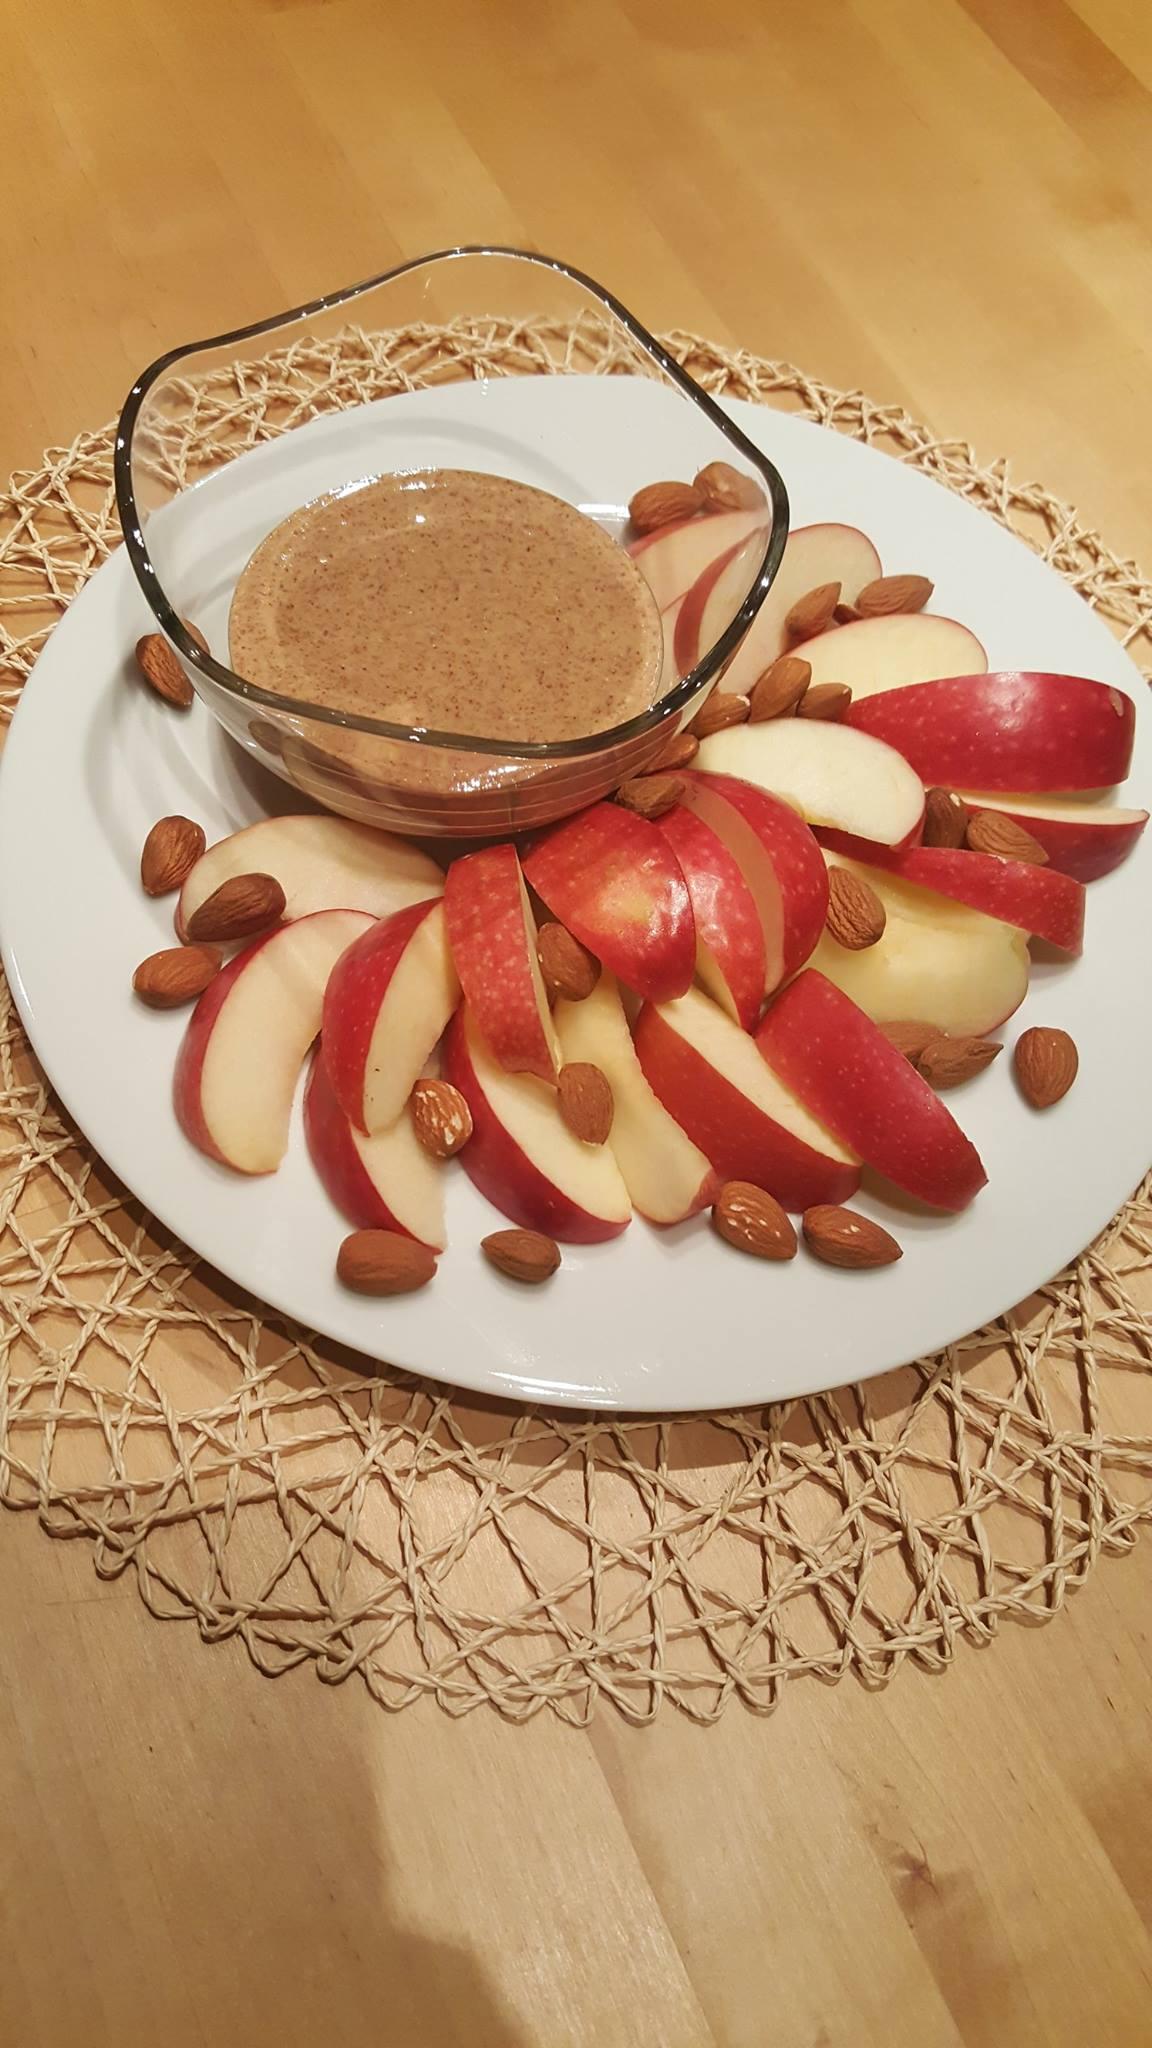 Body Detox Diet. Apple and almond nuts snack. https://www.wocdetox.com/body-detox-diet.html